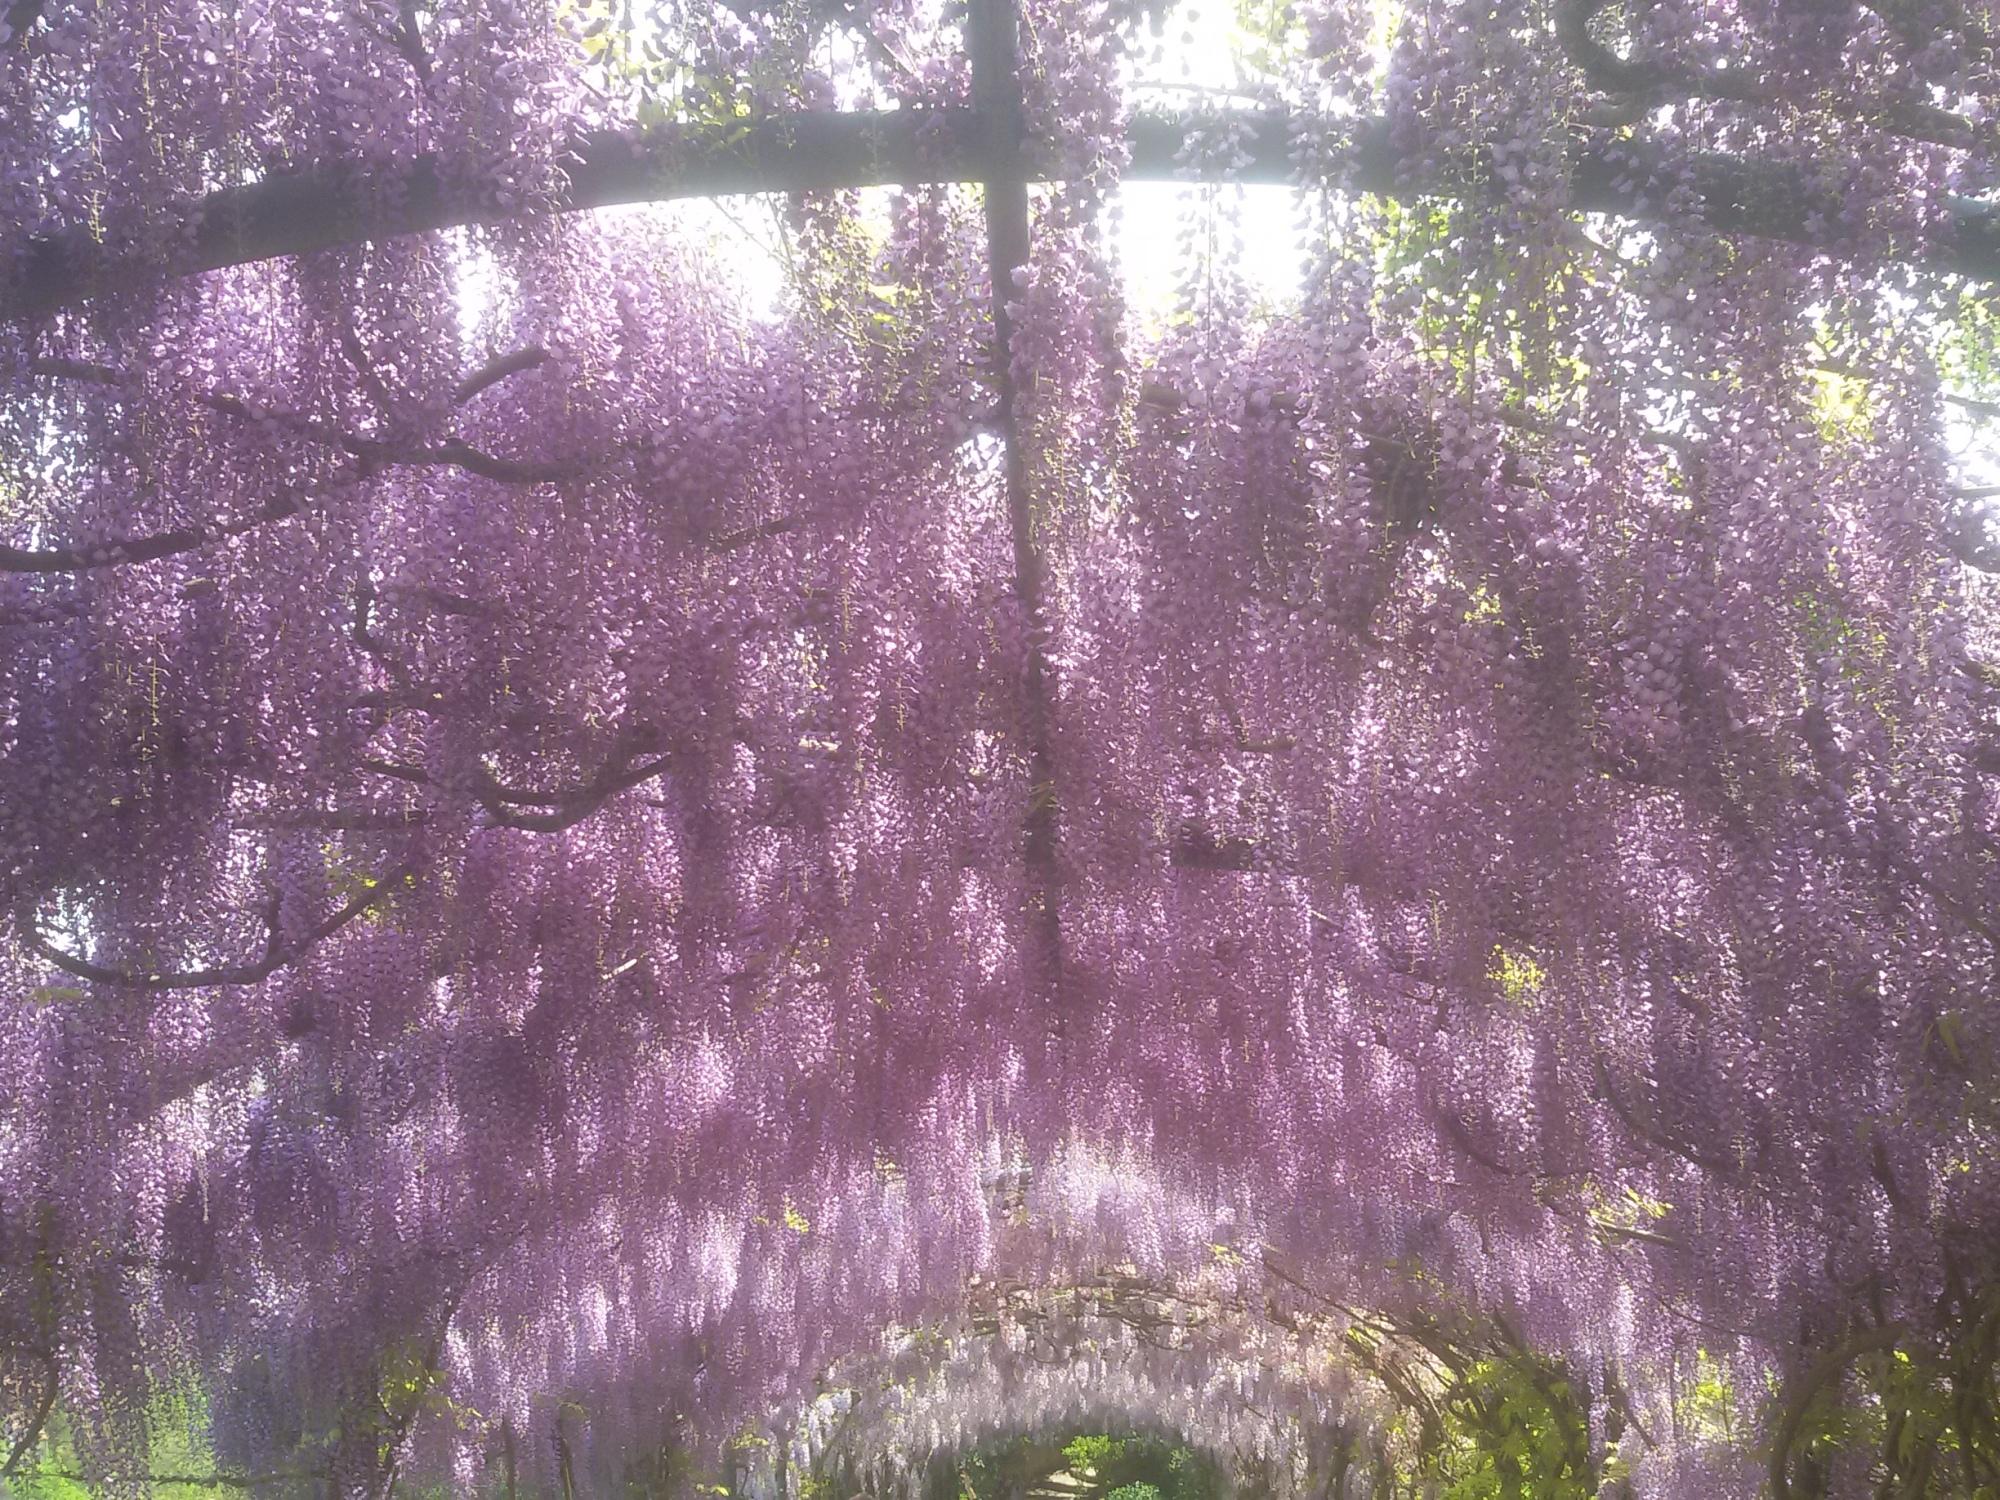 I giardini iris e rose incantati con il giardino di rachel - Arte e giardino ...